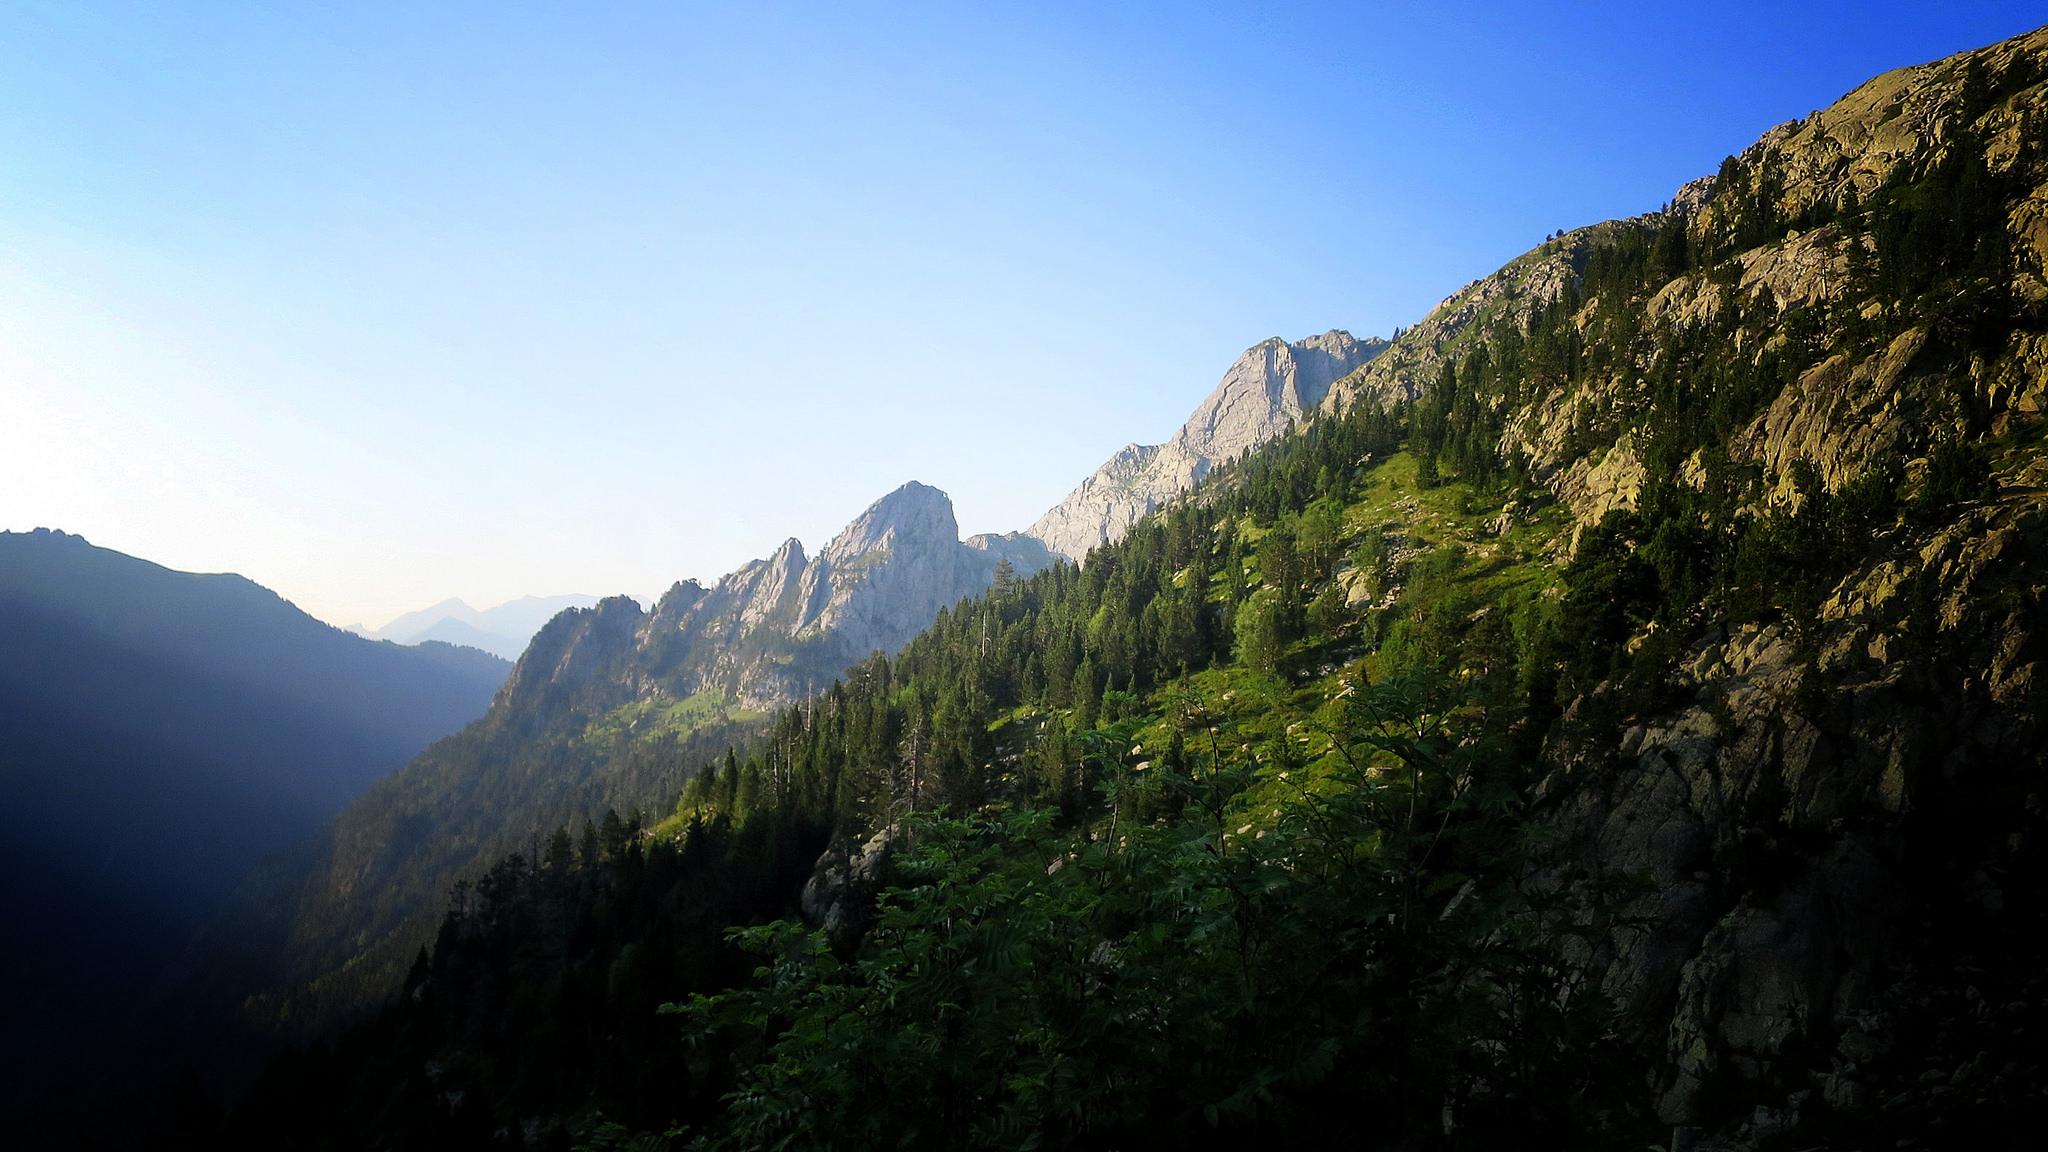 Valle de Eriste - https://www.flickr.com/photos/wenceslaugraus/